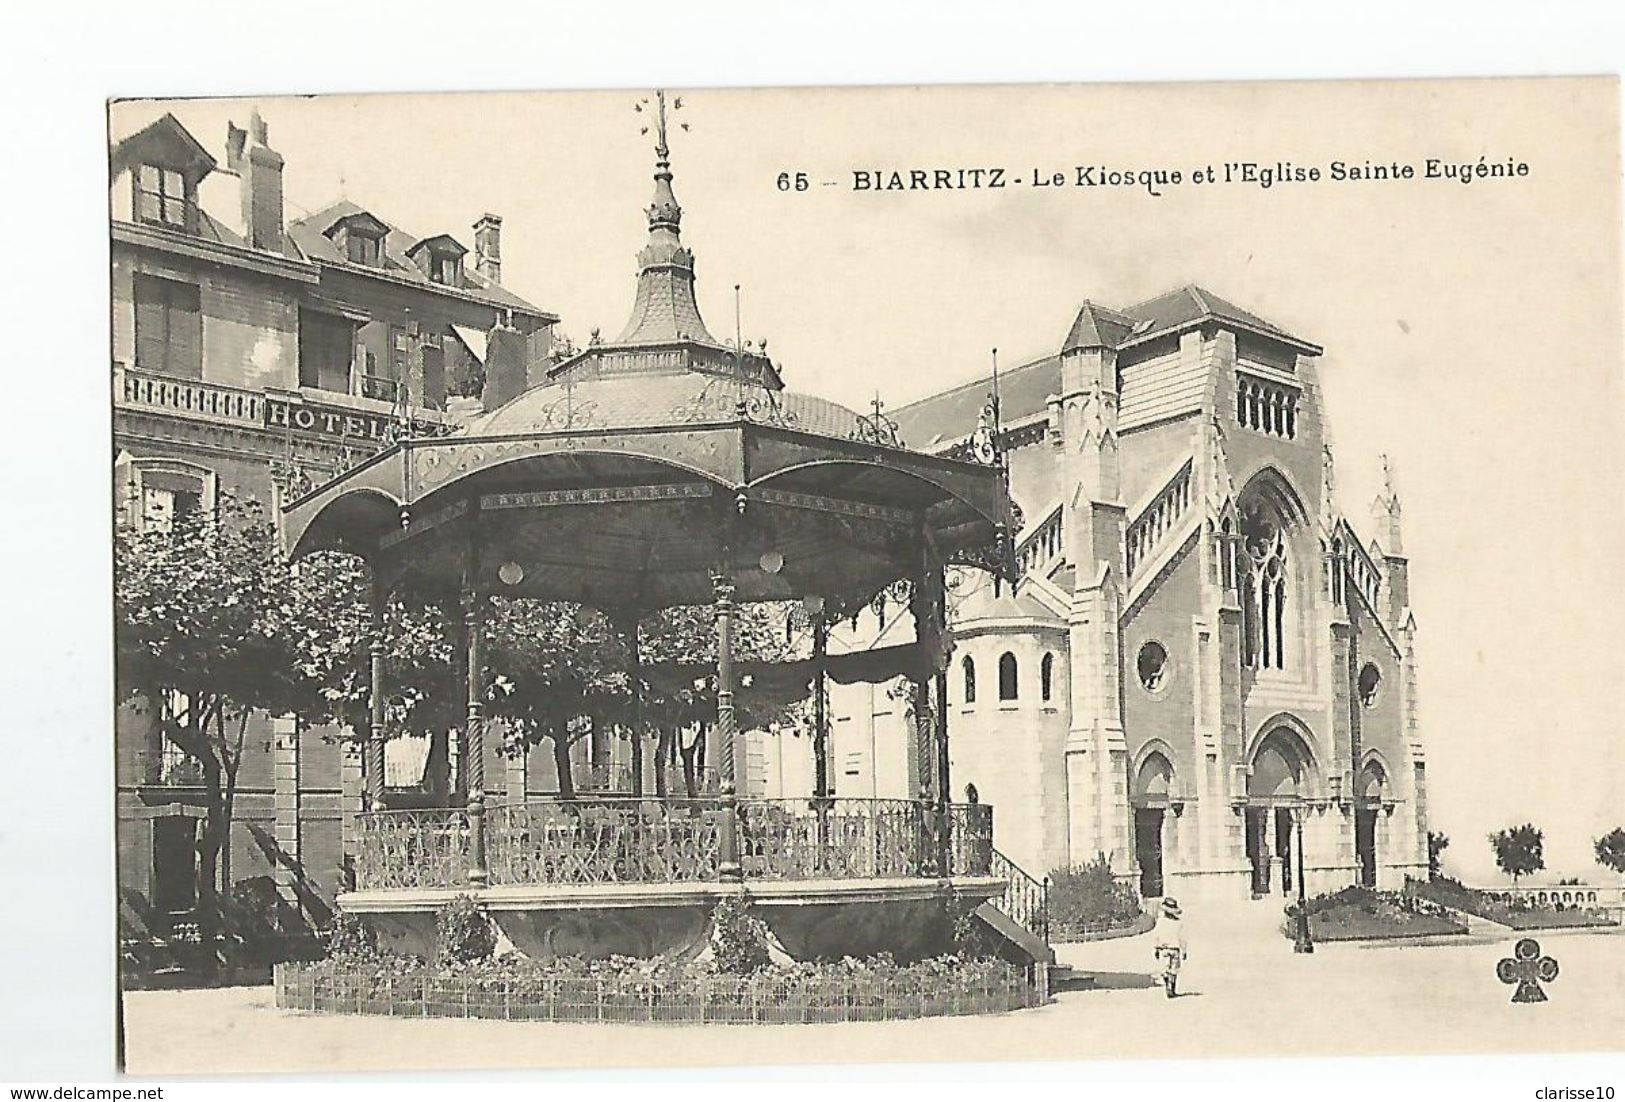 64 Biarritz Le Kiosque Et L'Eglise Sainte Eugenie - Biarritz